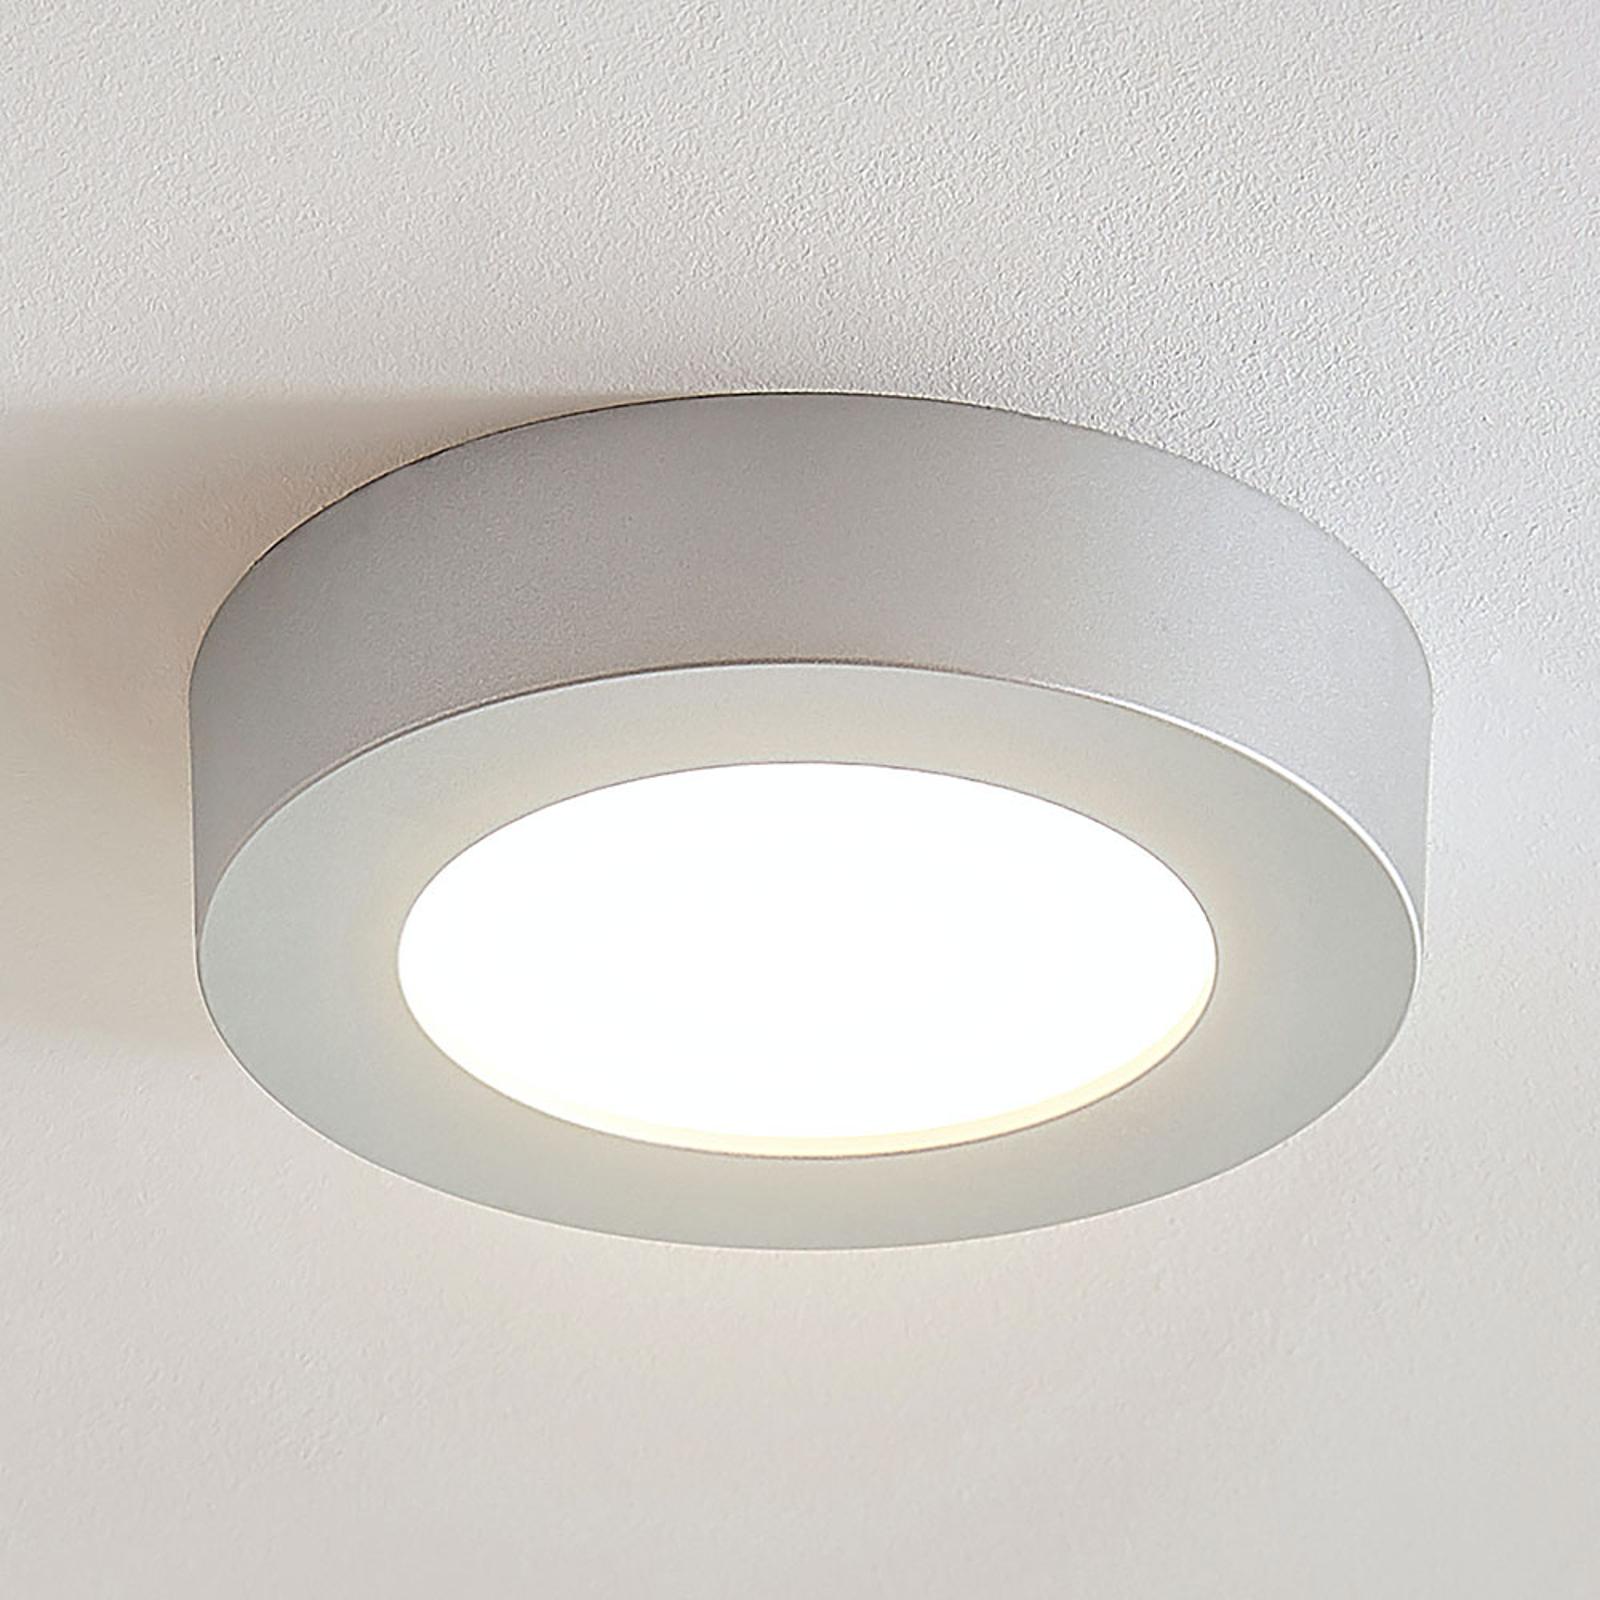 Marlo LED-loftlampe sølv 3000K rund 18,2cm